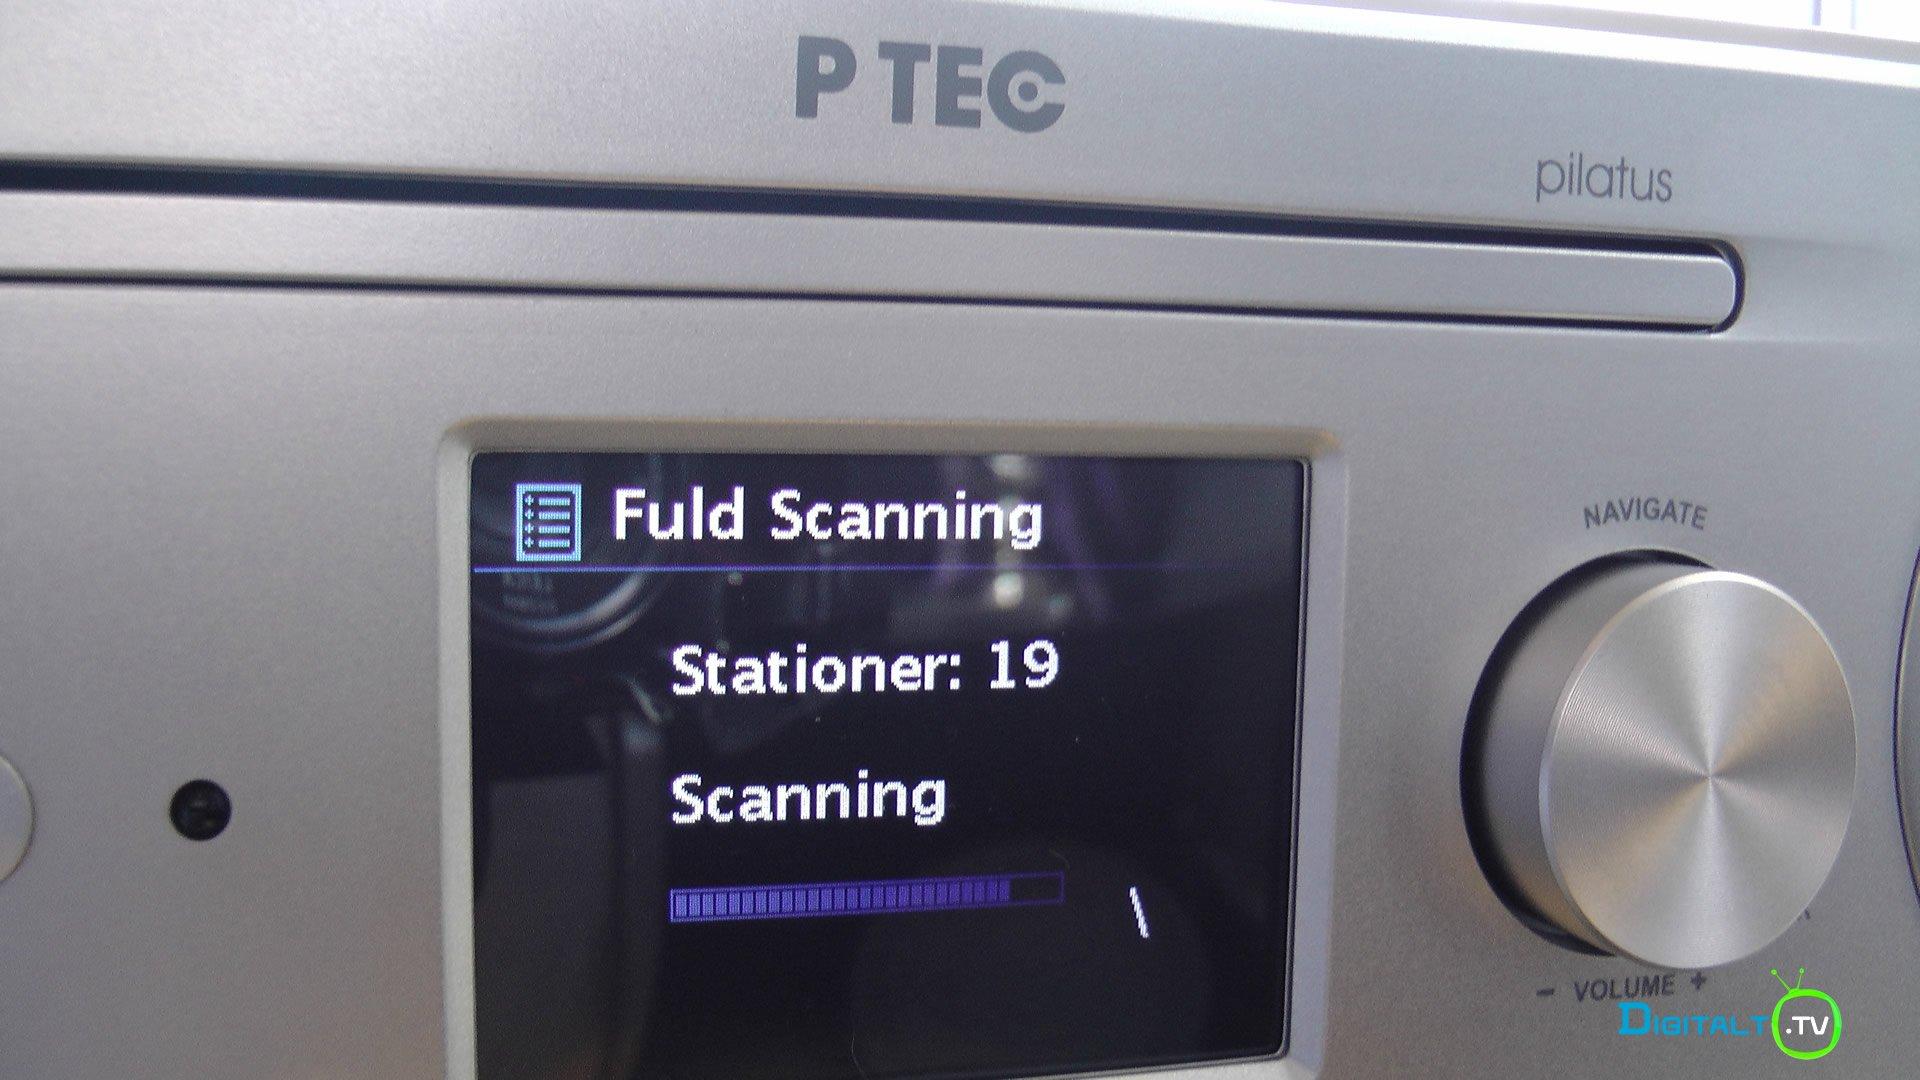 Pilatus dab scanning